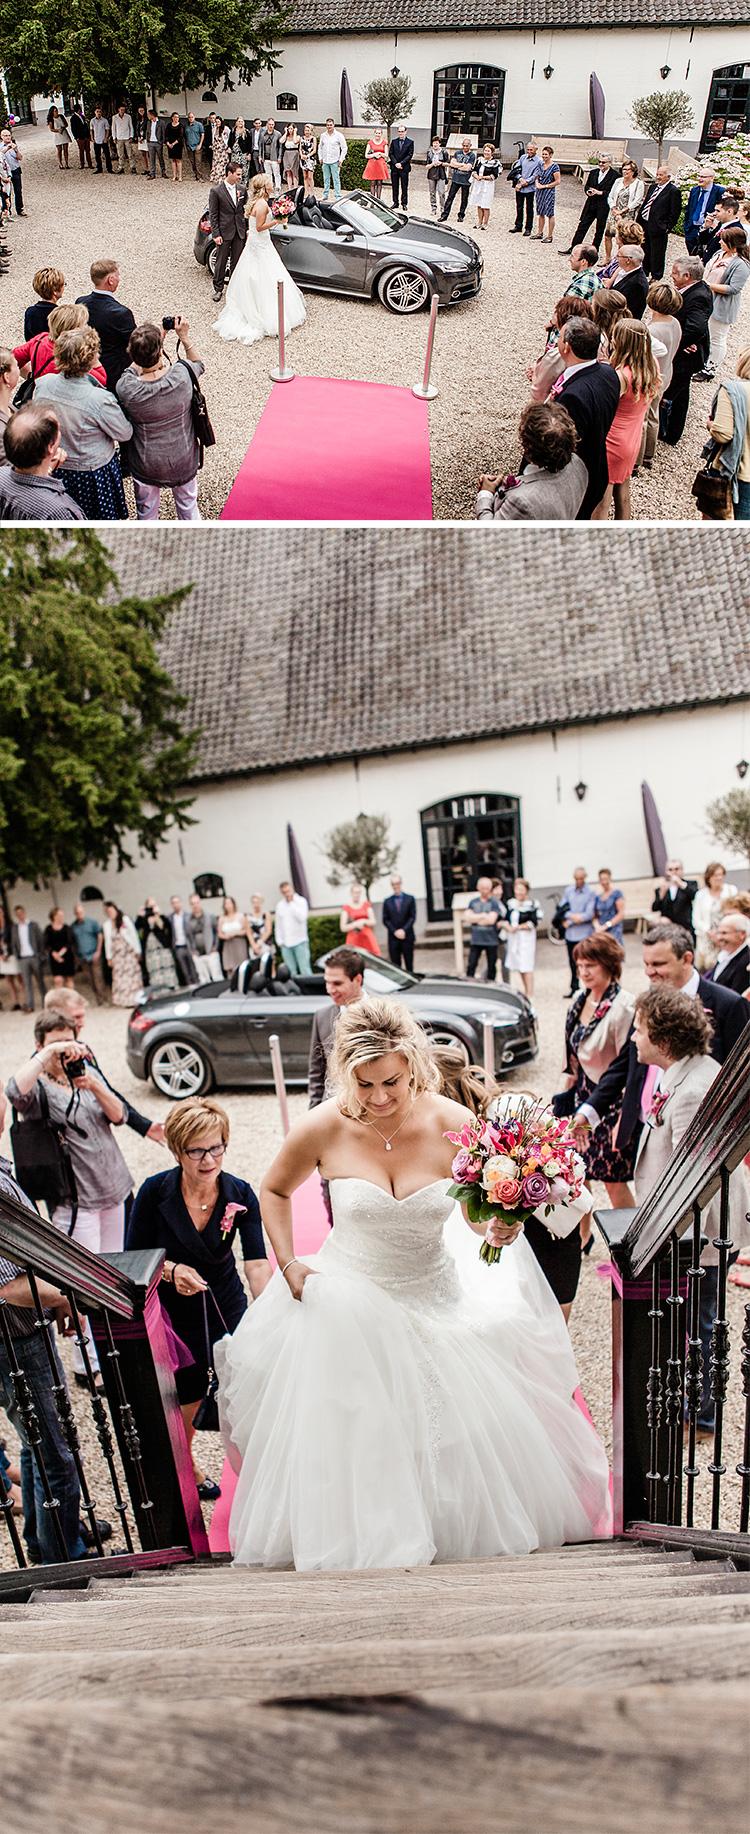 Bas-Driessen-Fotografie-Bruidsreportage-Anton-Marlies-23